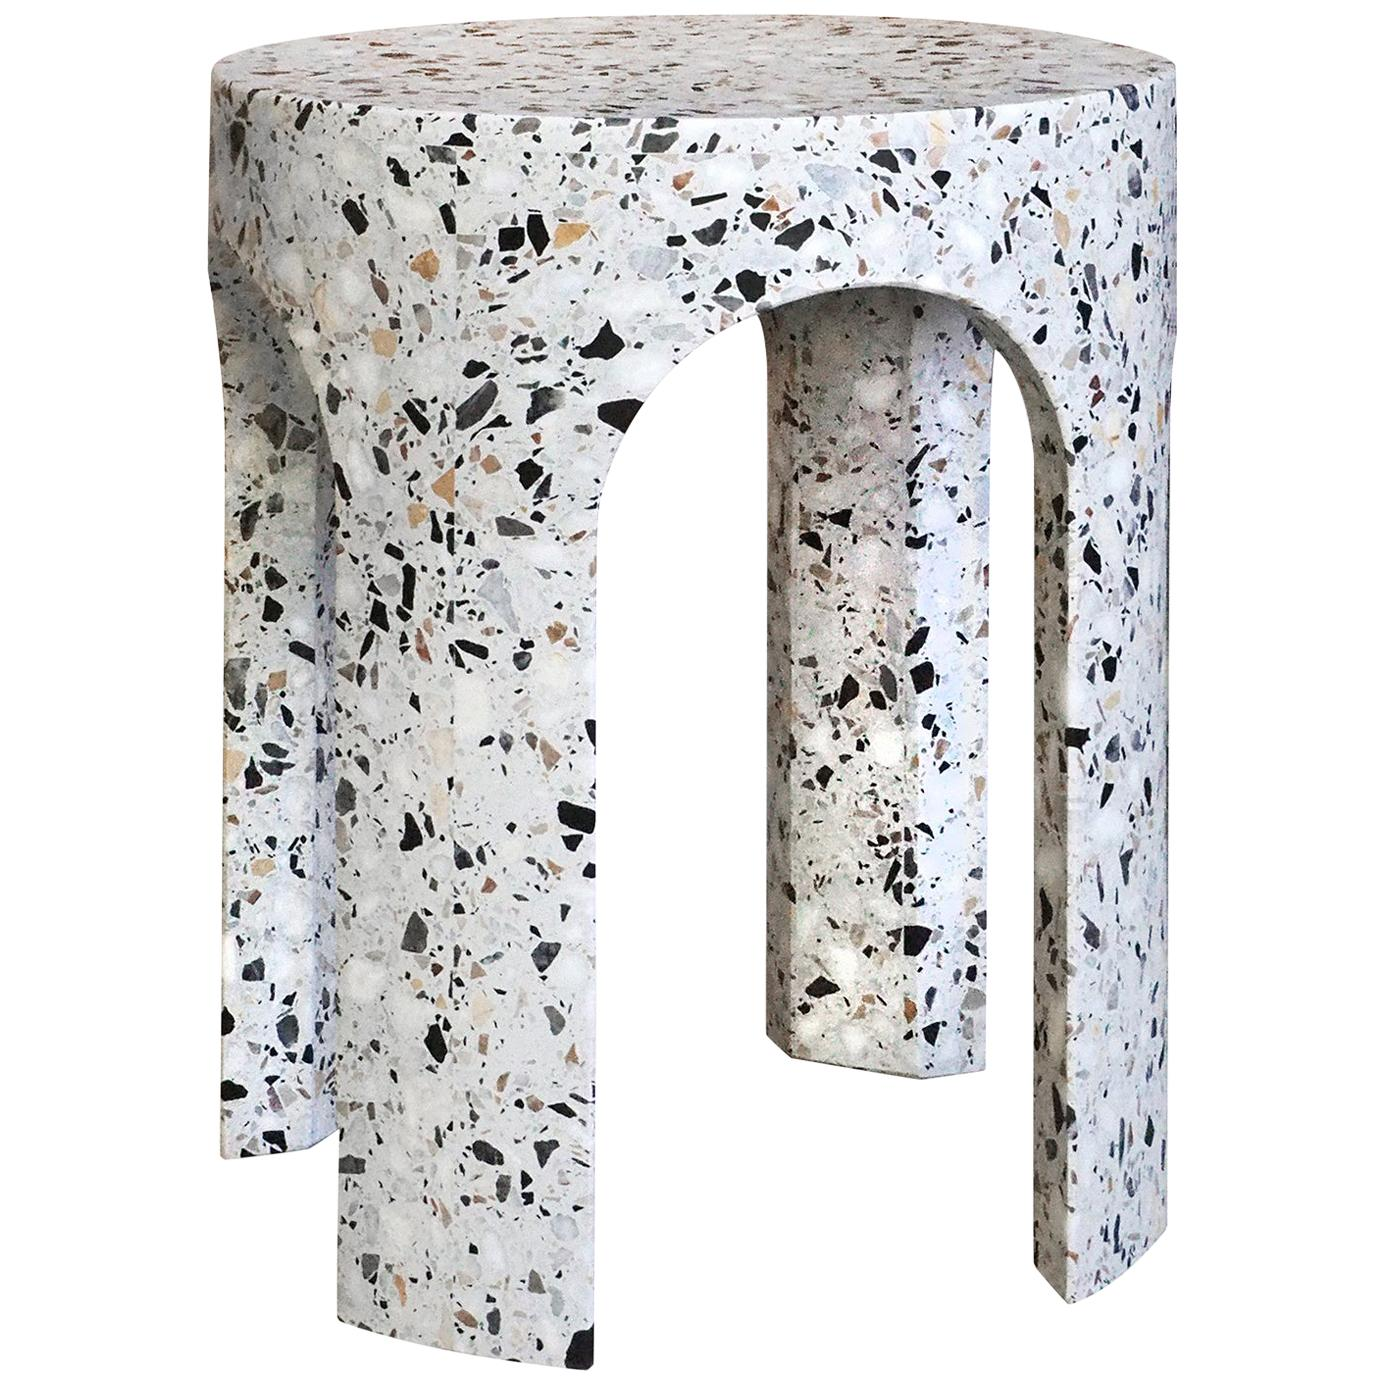 Loggia Small Side Table / White Terrazzo Marble by Portego